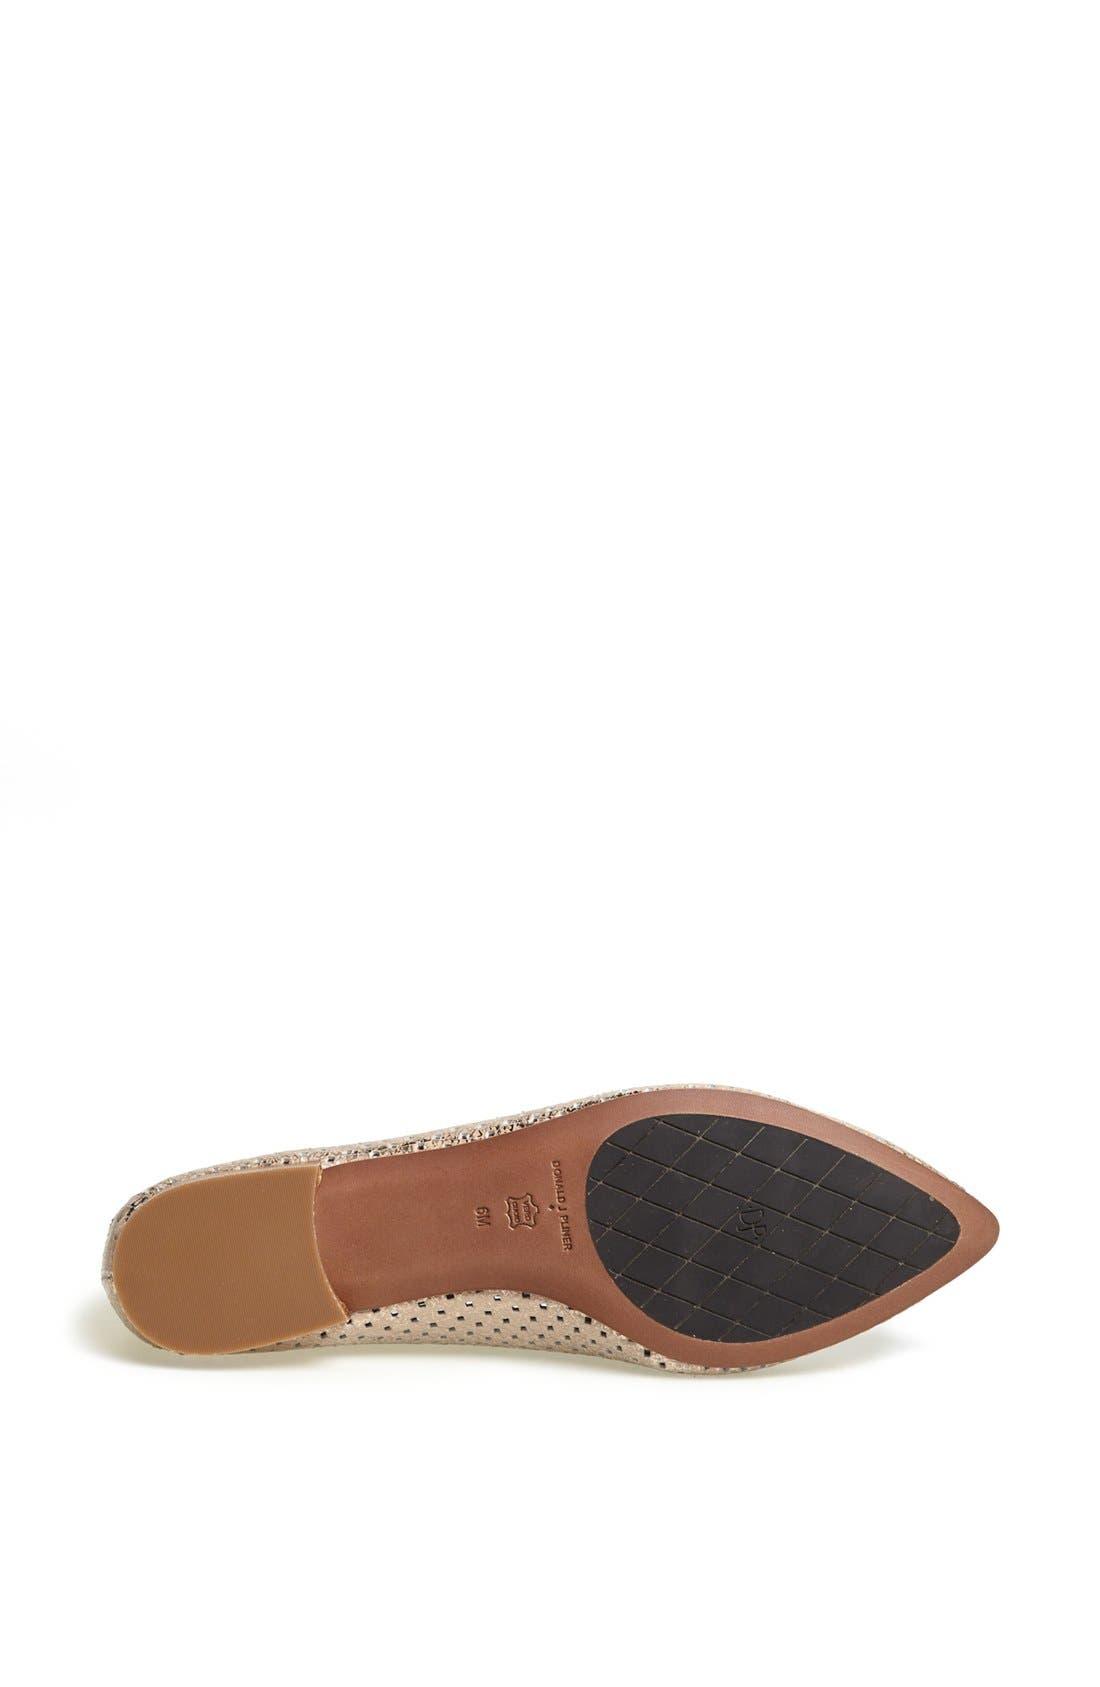 Alternate Image 4  - Donald J Pliner 'Ava' Pointed Toe Flat